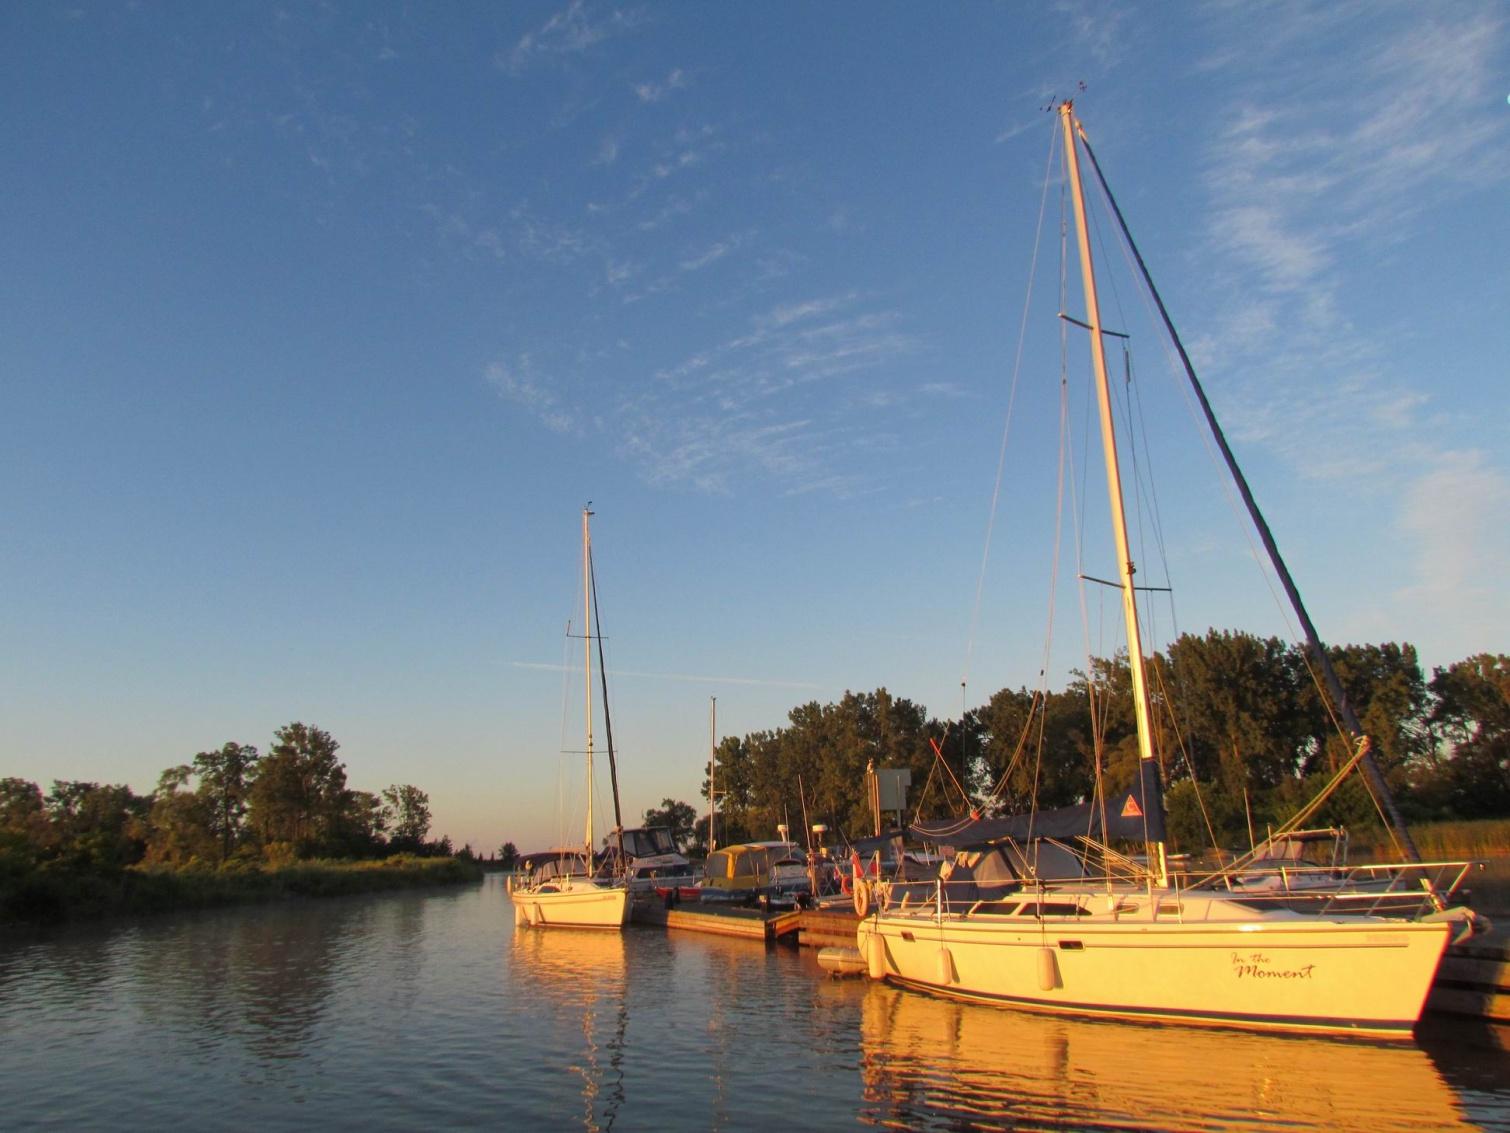 Click image for larger version  Name:wellington harbour.jpg Views:181 Size:411.5 KB ID:96160